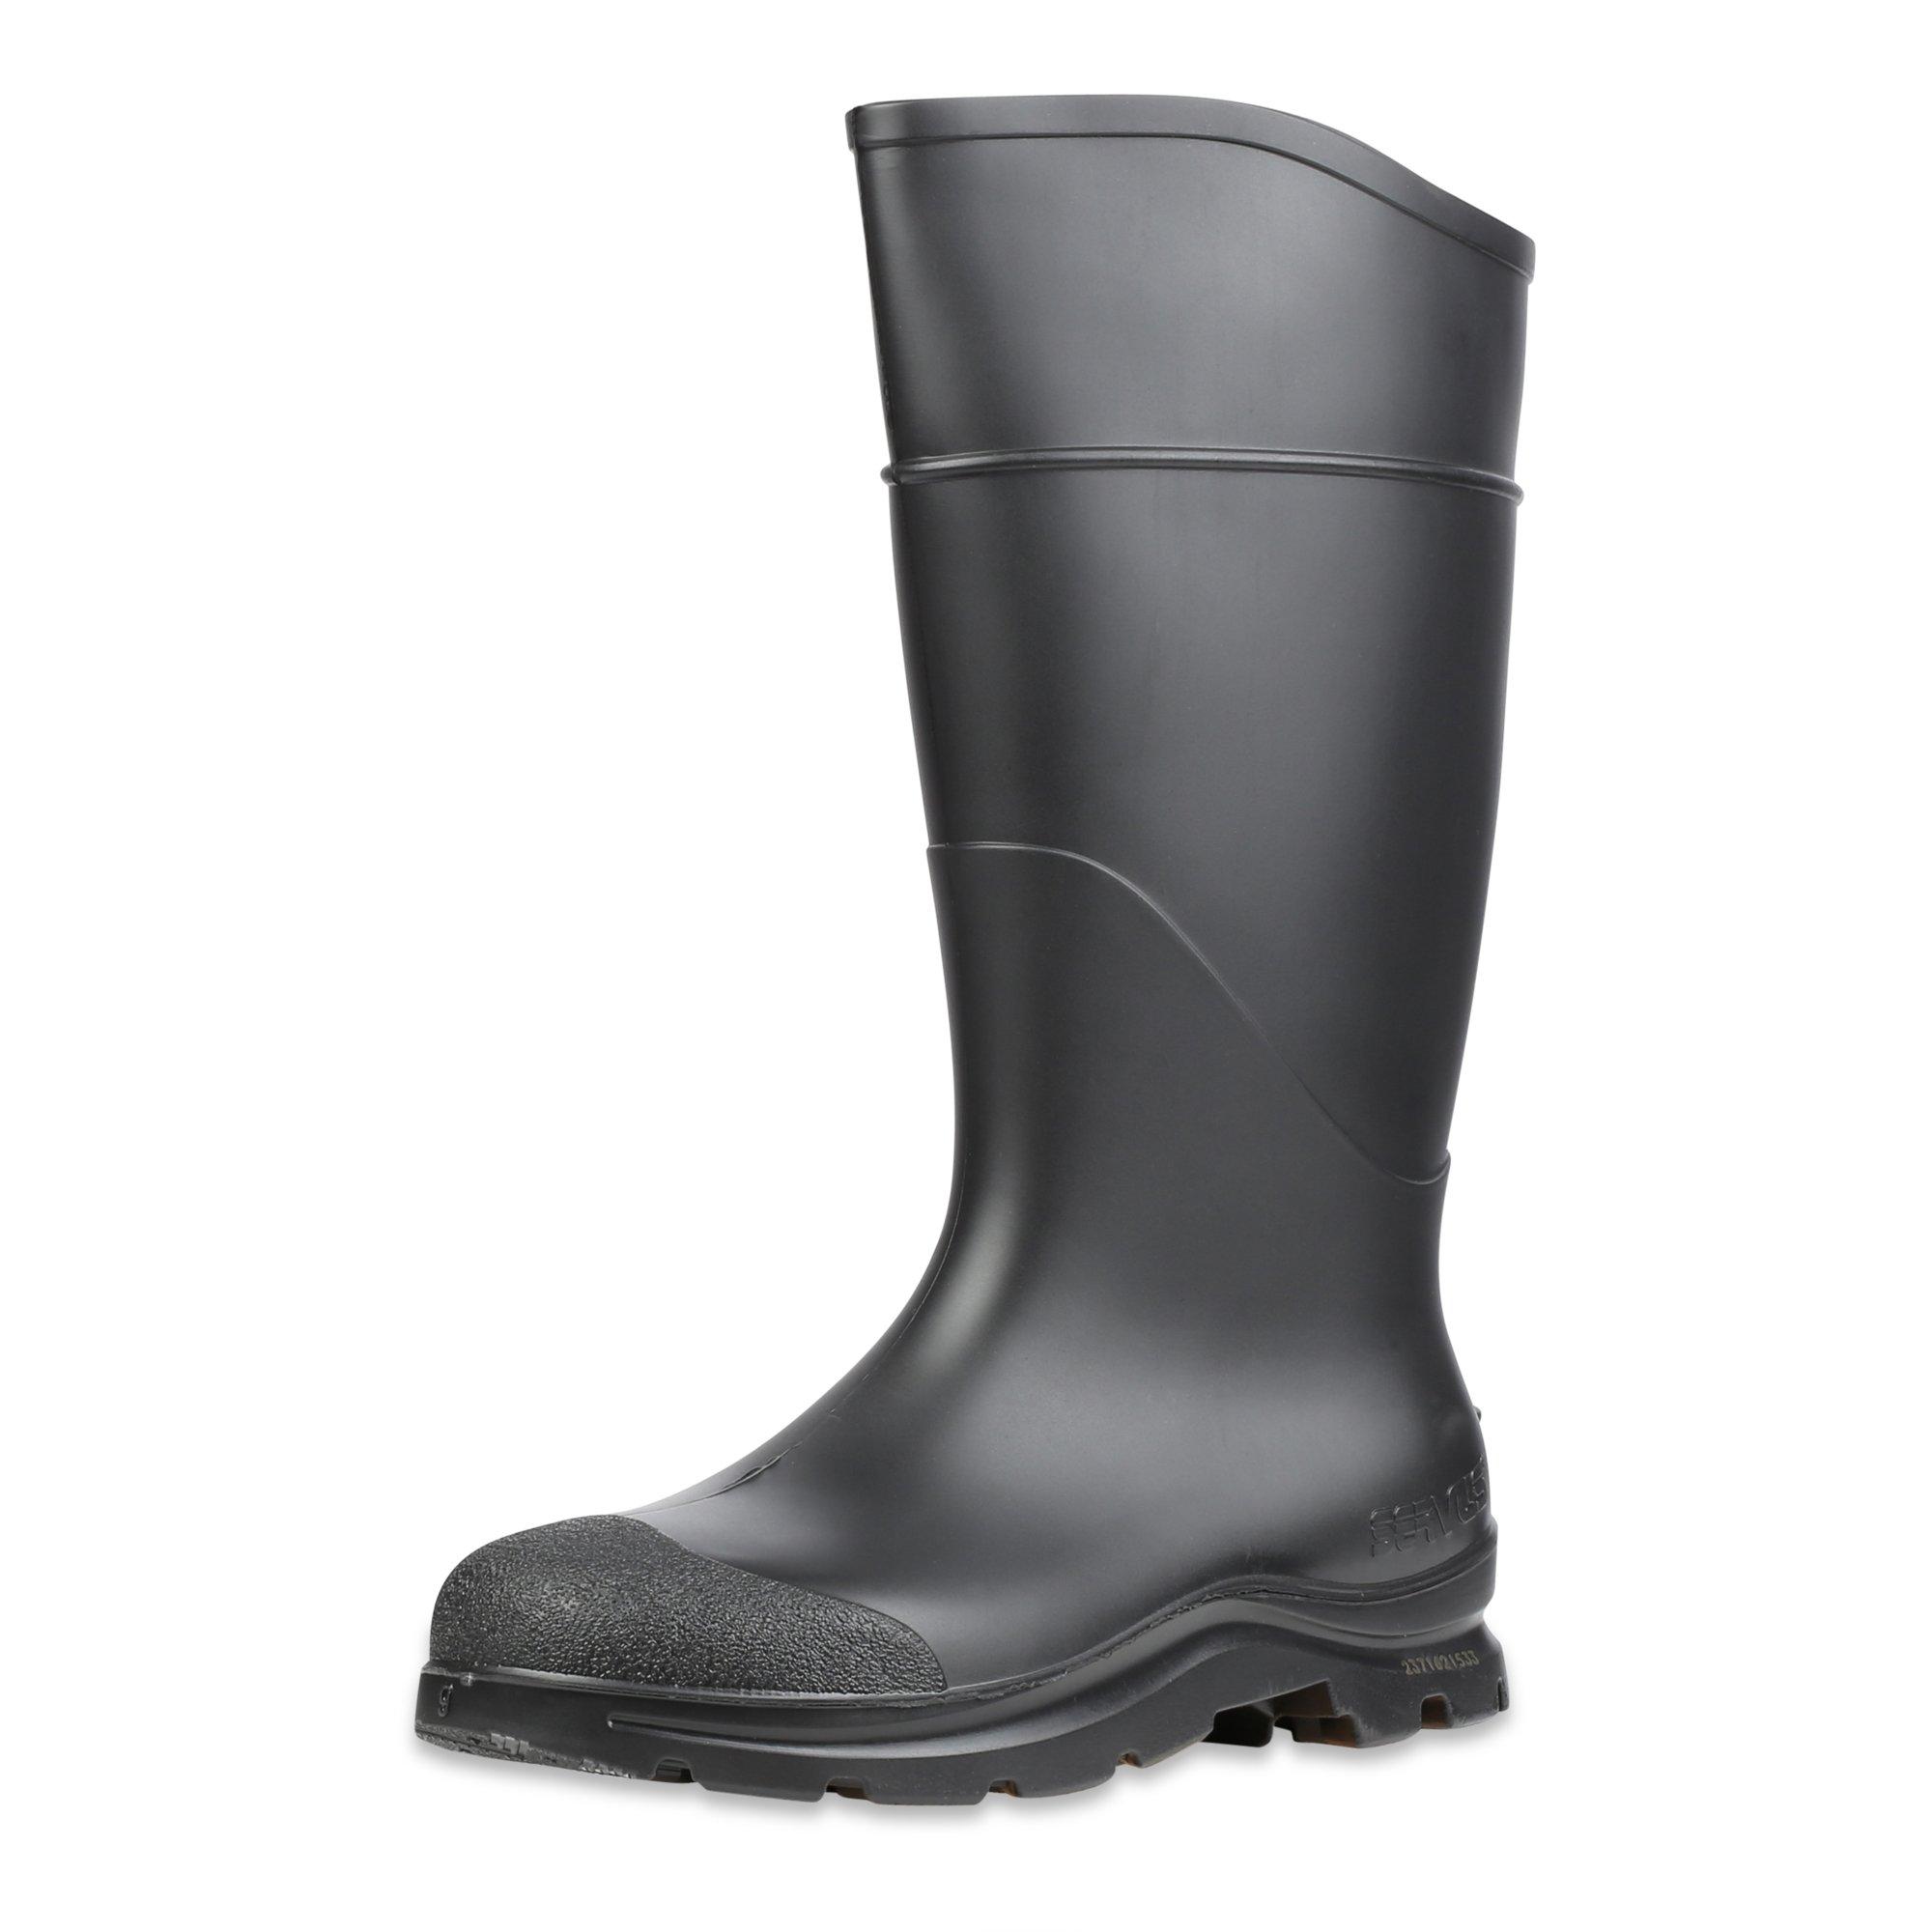 "Servus Comfort Technology 14"" PVC Soft Toe Men's Work Boots, 7"